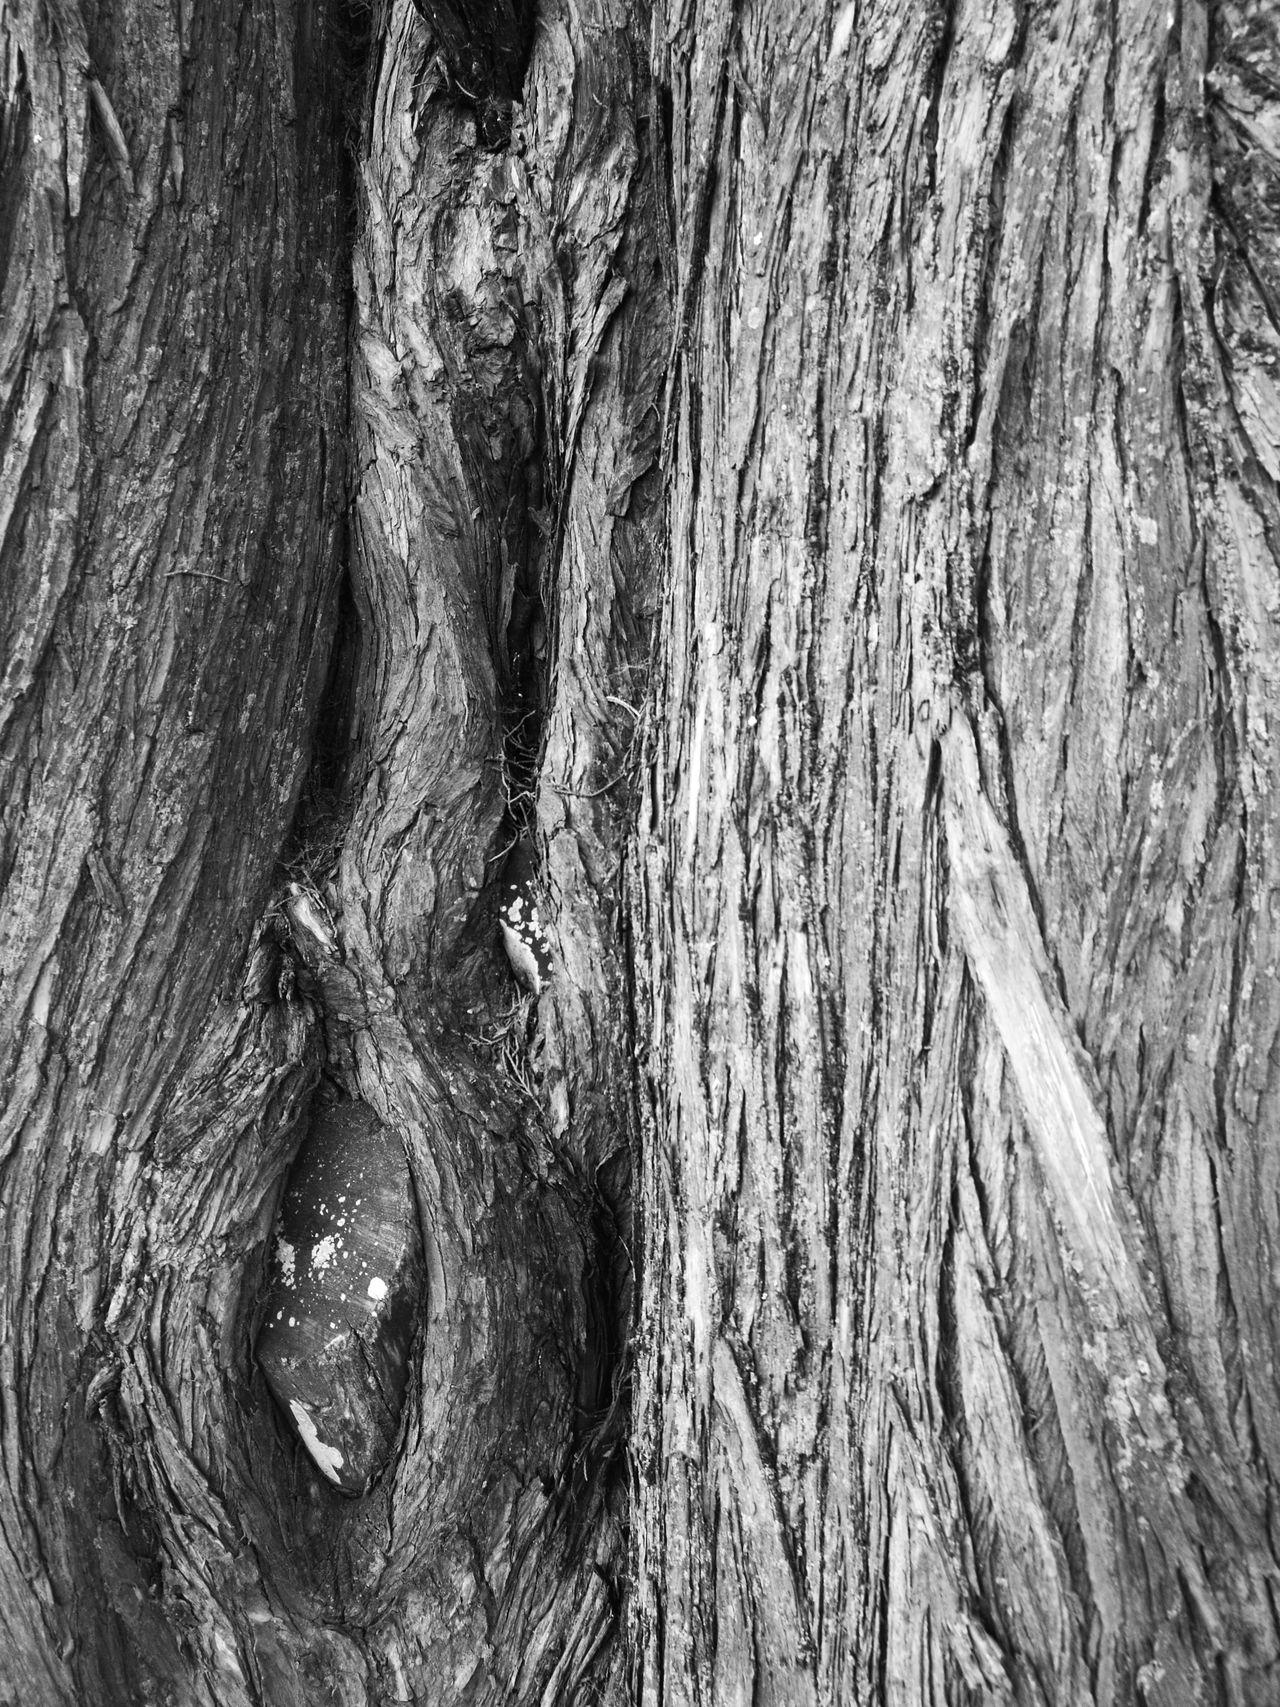 B&w Photo B&w Monochrome Photograhy Monochrome Collection B&W Collection B&WPhoto B&W Photo Lifestyle Tree Trunk Textured  Wood - Material Tree Close-up No People Wood Grain Tranquility In Nature Blackandwhite Photography Texture Arbre écorce La Bernerie En Retz Loire-atlantique France🇫🇷 Huawei P9. Photography